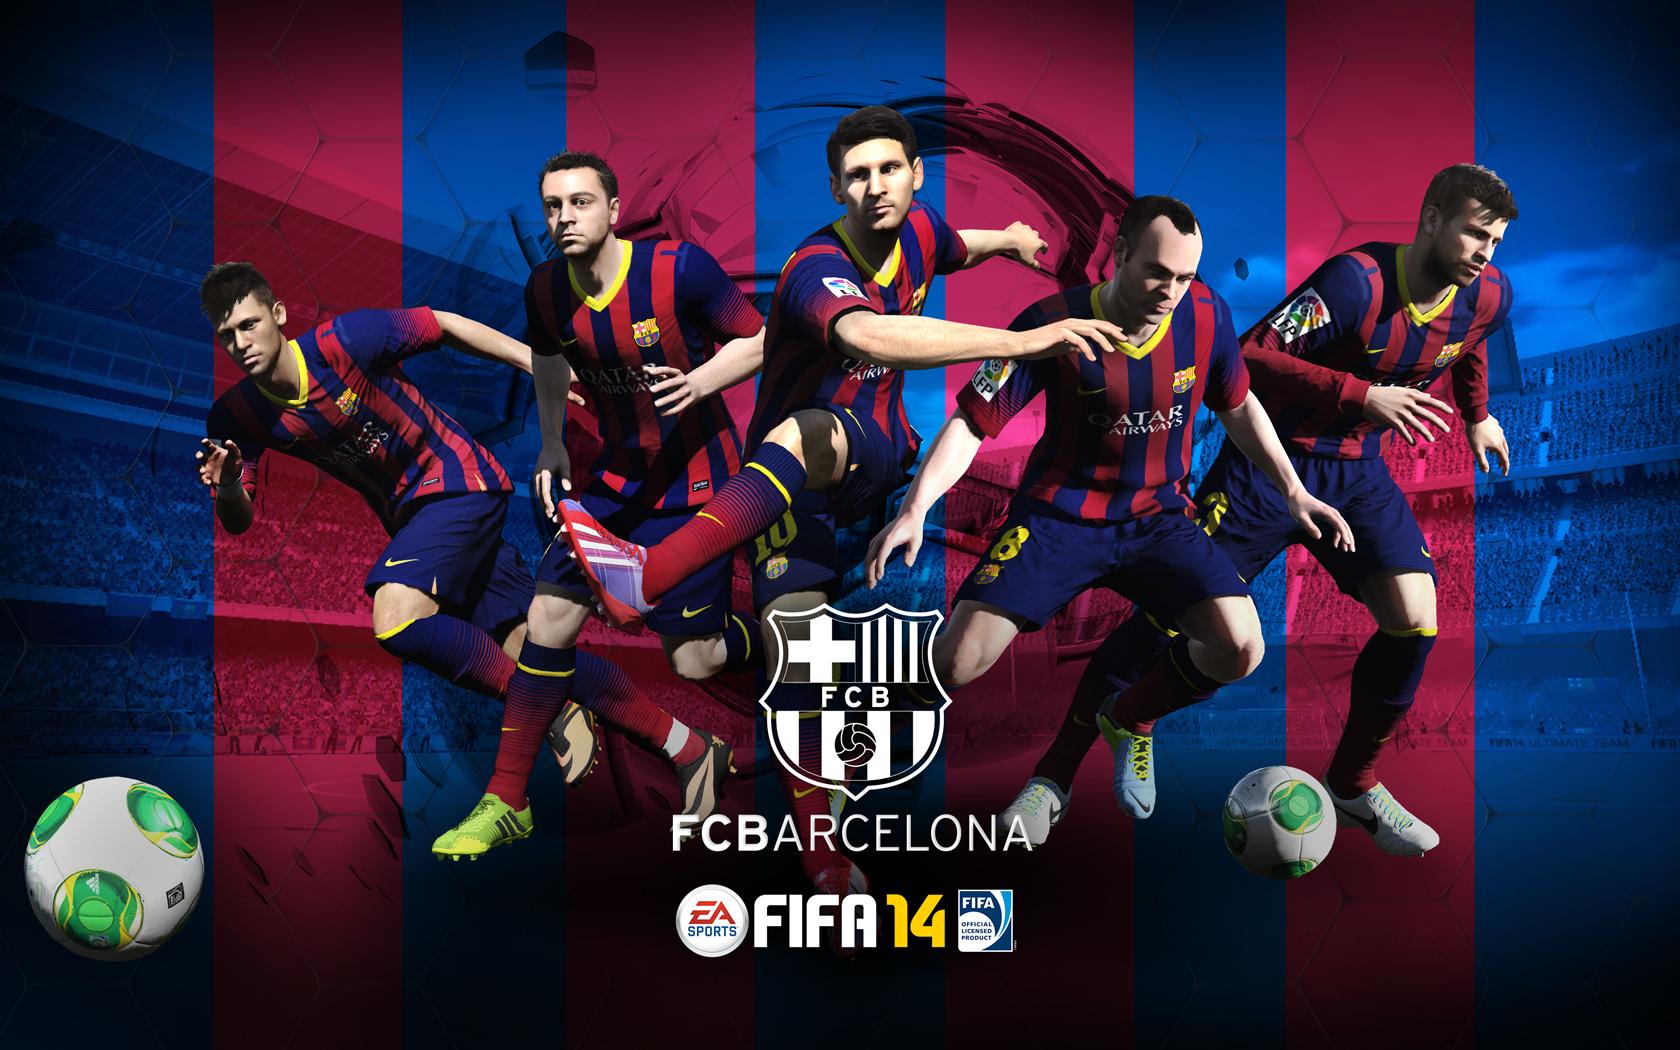 Ea Sports Se Une Al Fc Barcelona Como Partner Oficial